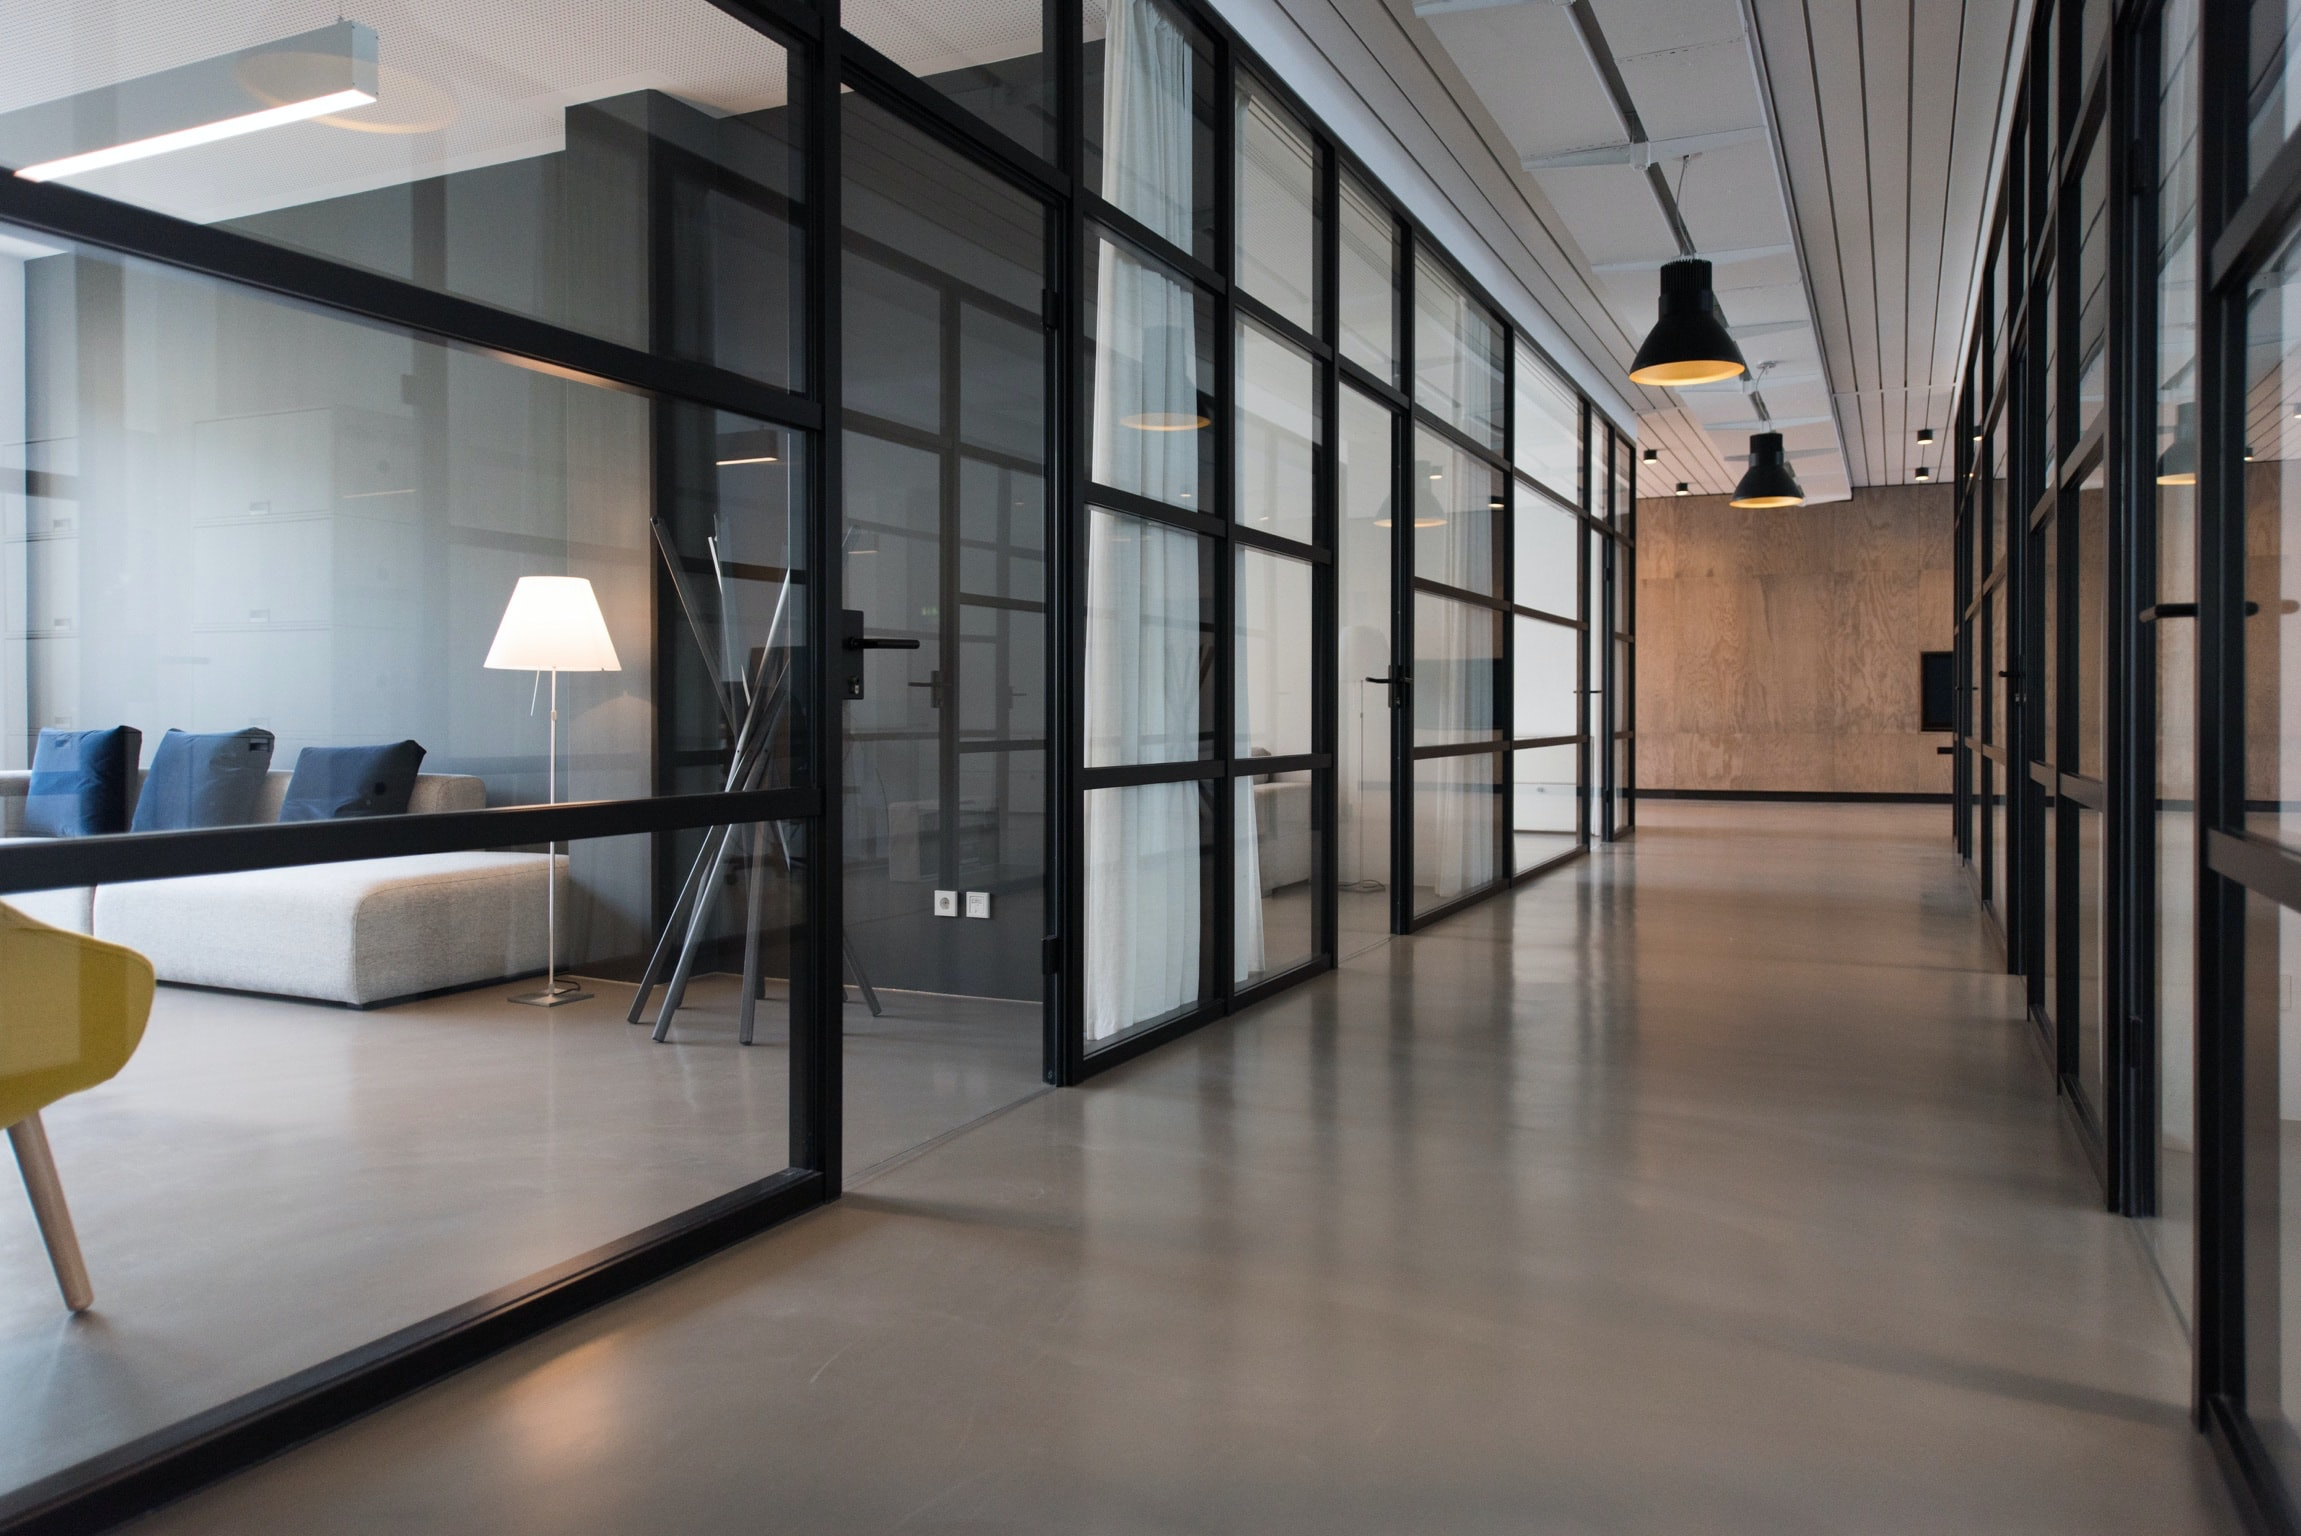 Normativa PCI hoteles - Drexmin Sistemas Contra Incendios